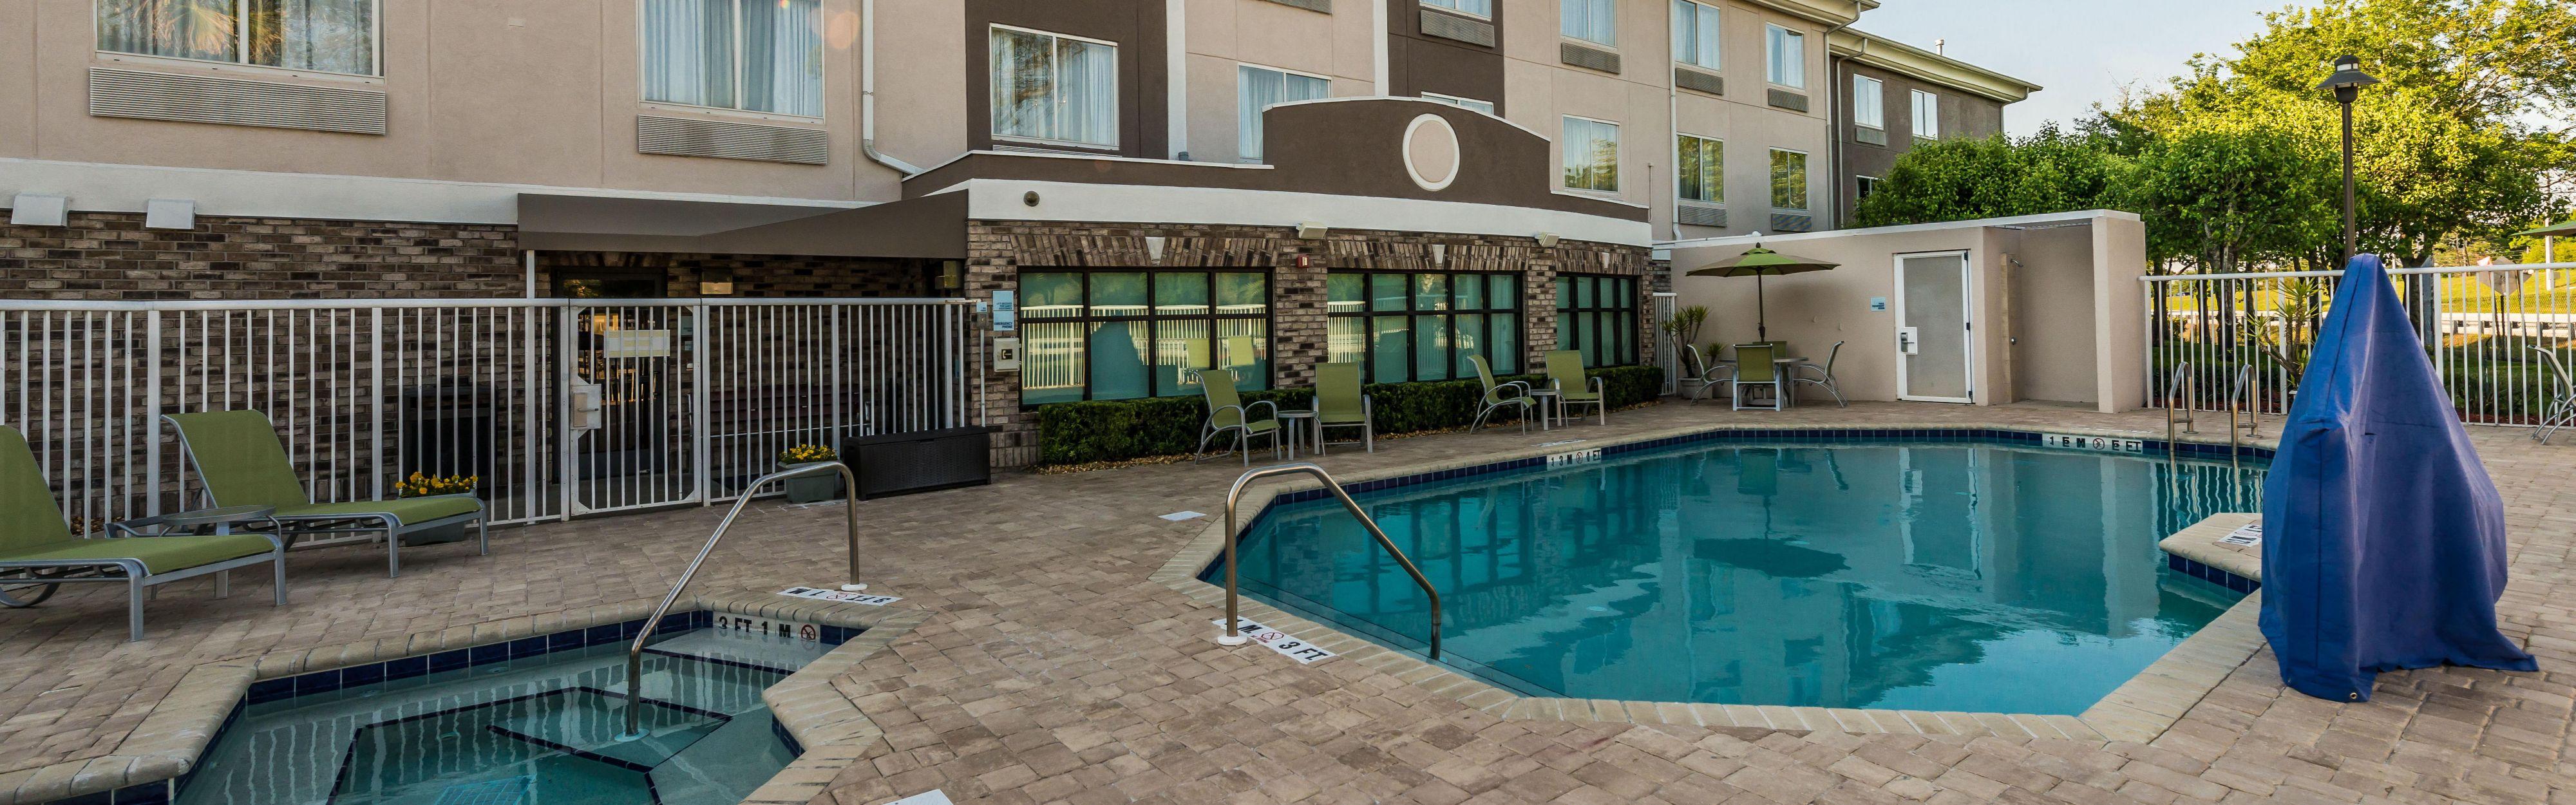 Holiday Inn Express & Suites Jacksonville - Blount Island image 2